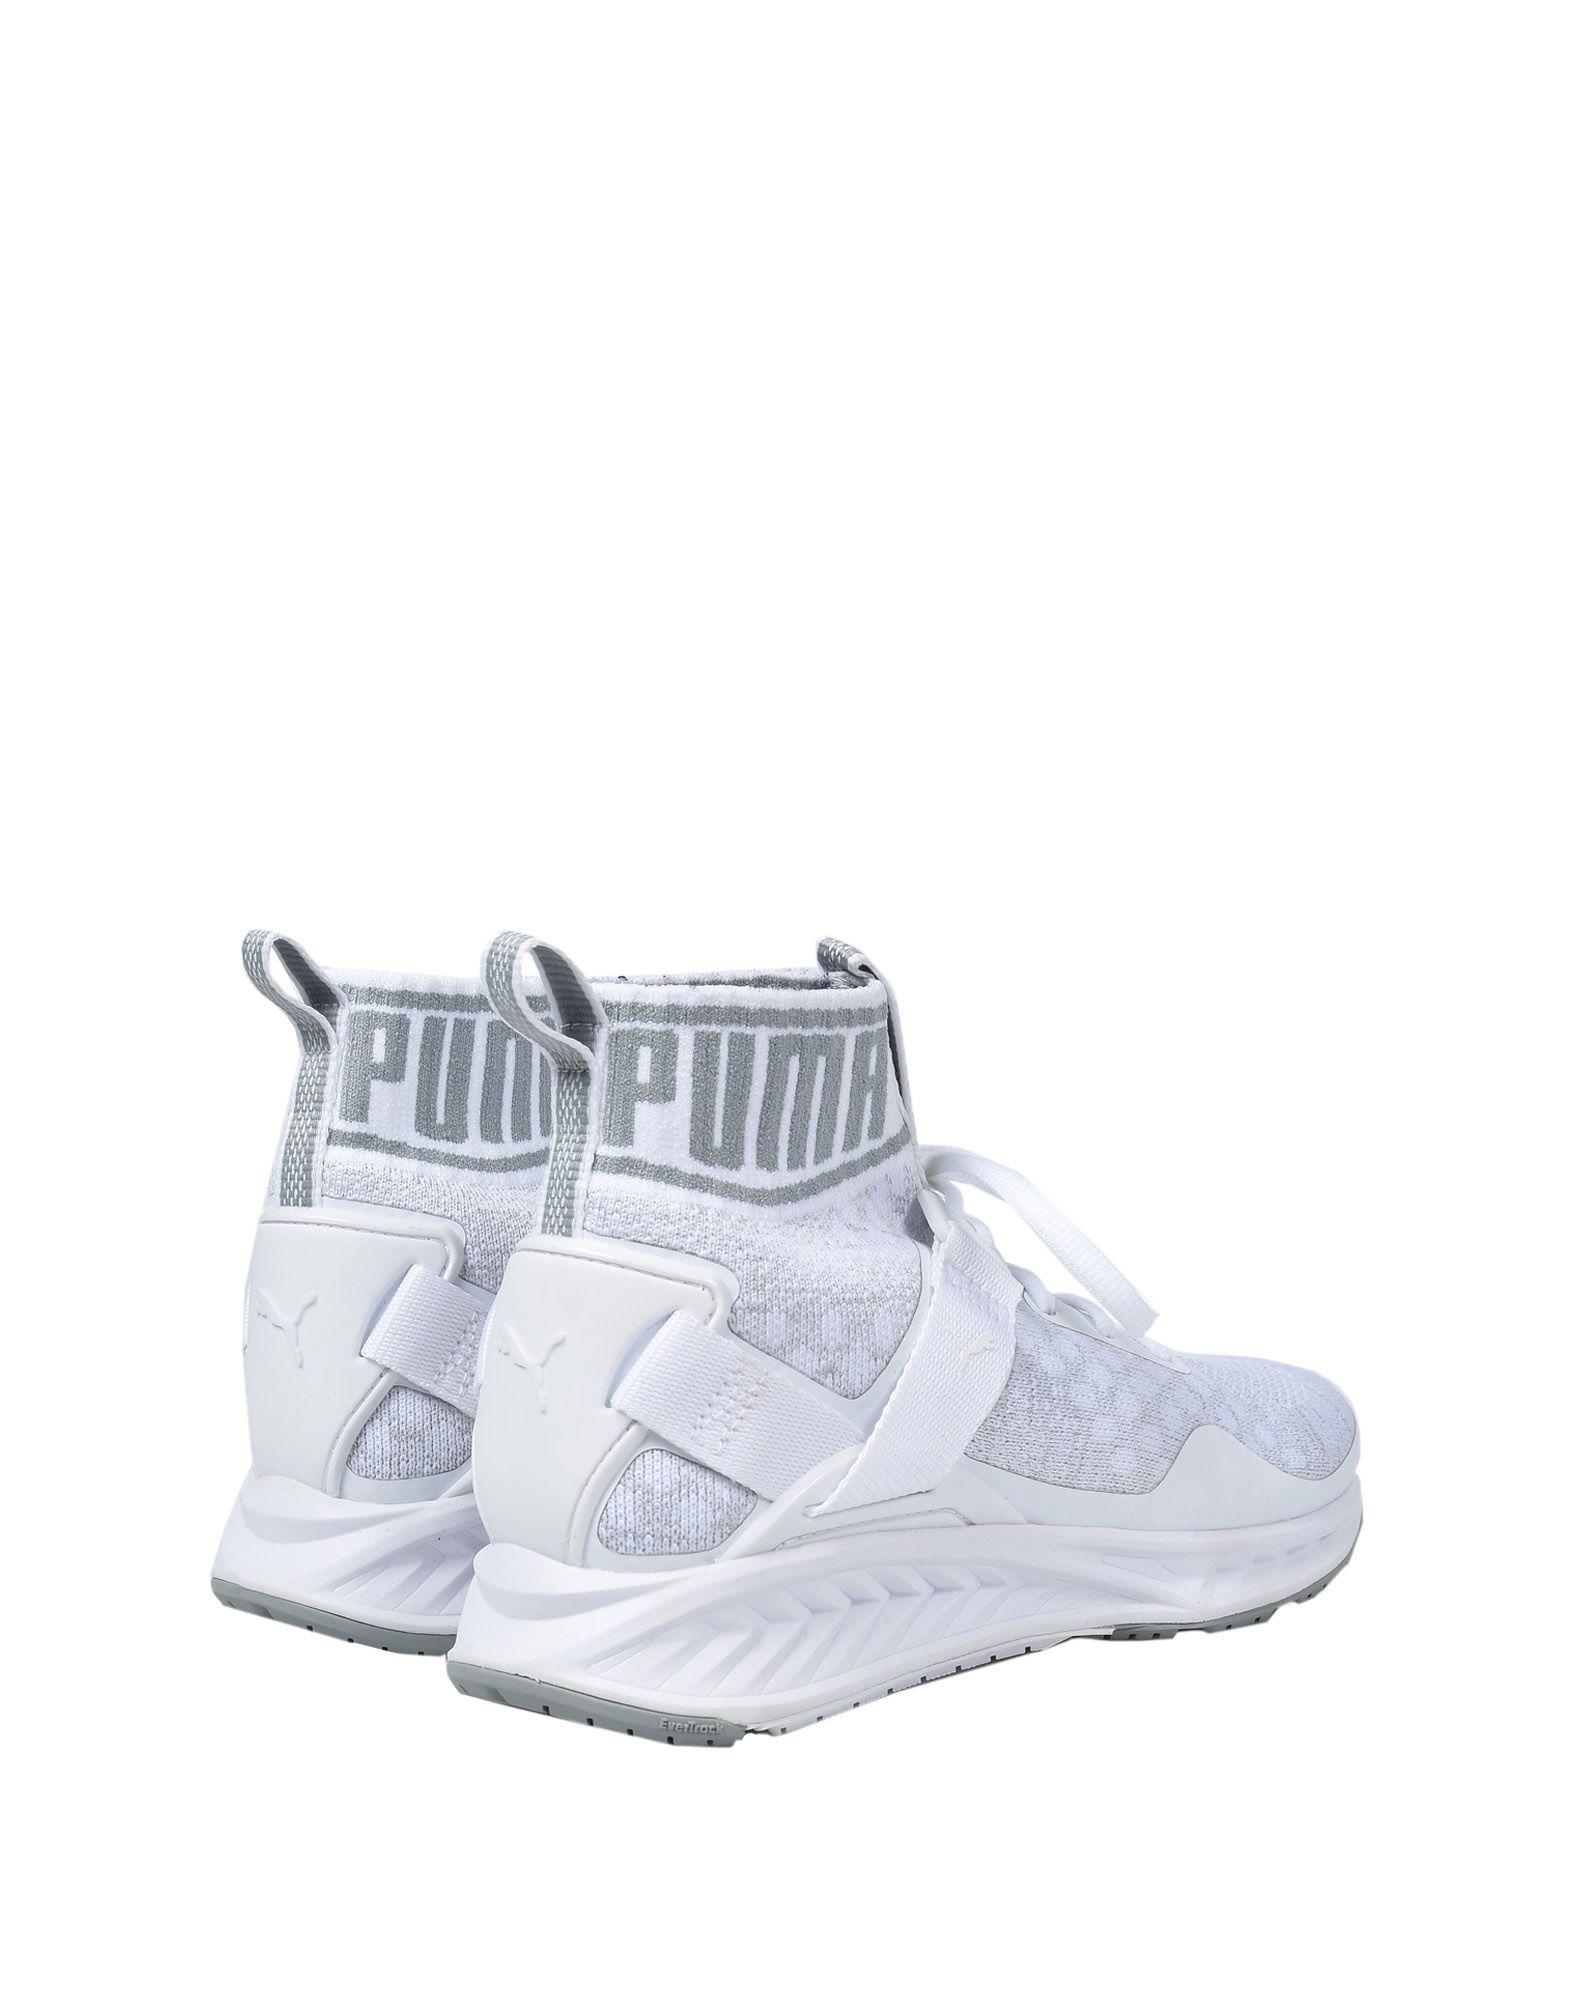 buy popular 81432 f1b54 Puma Ignite Evoknit Wn's - Sneakers - Women Women Women ...